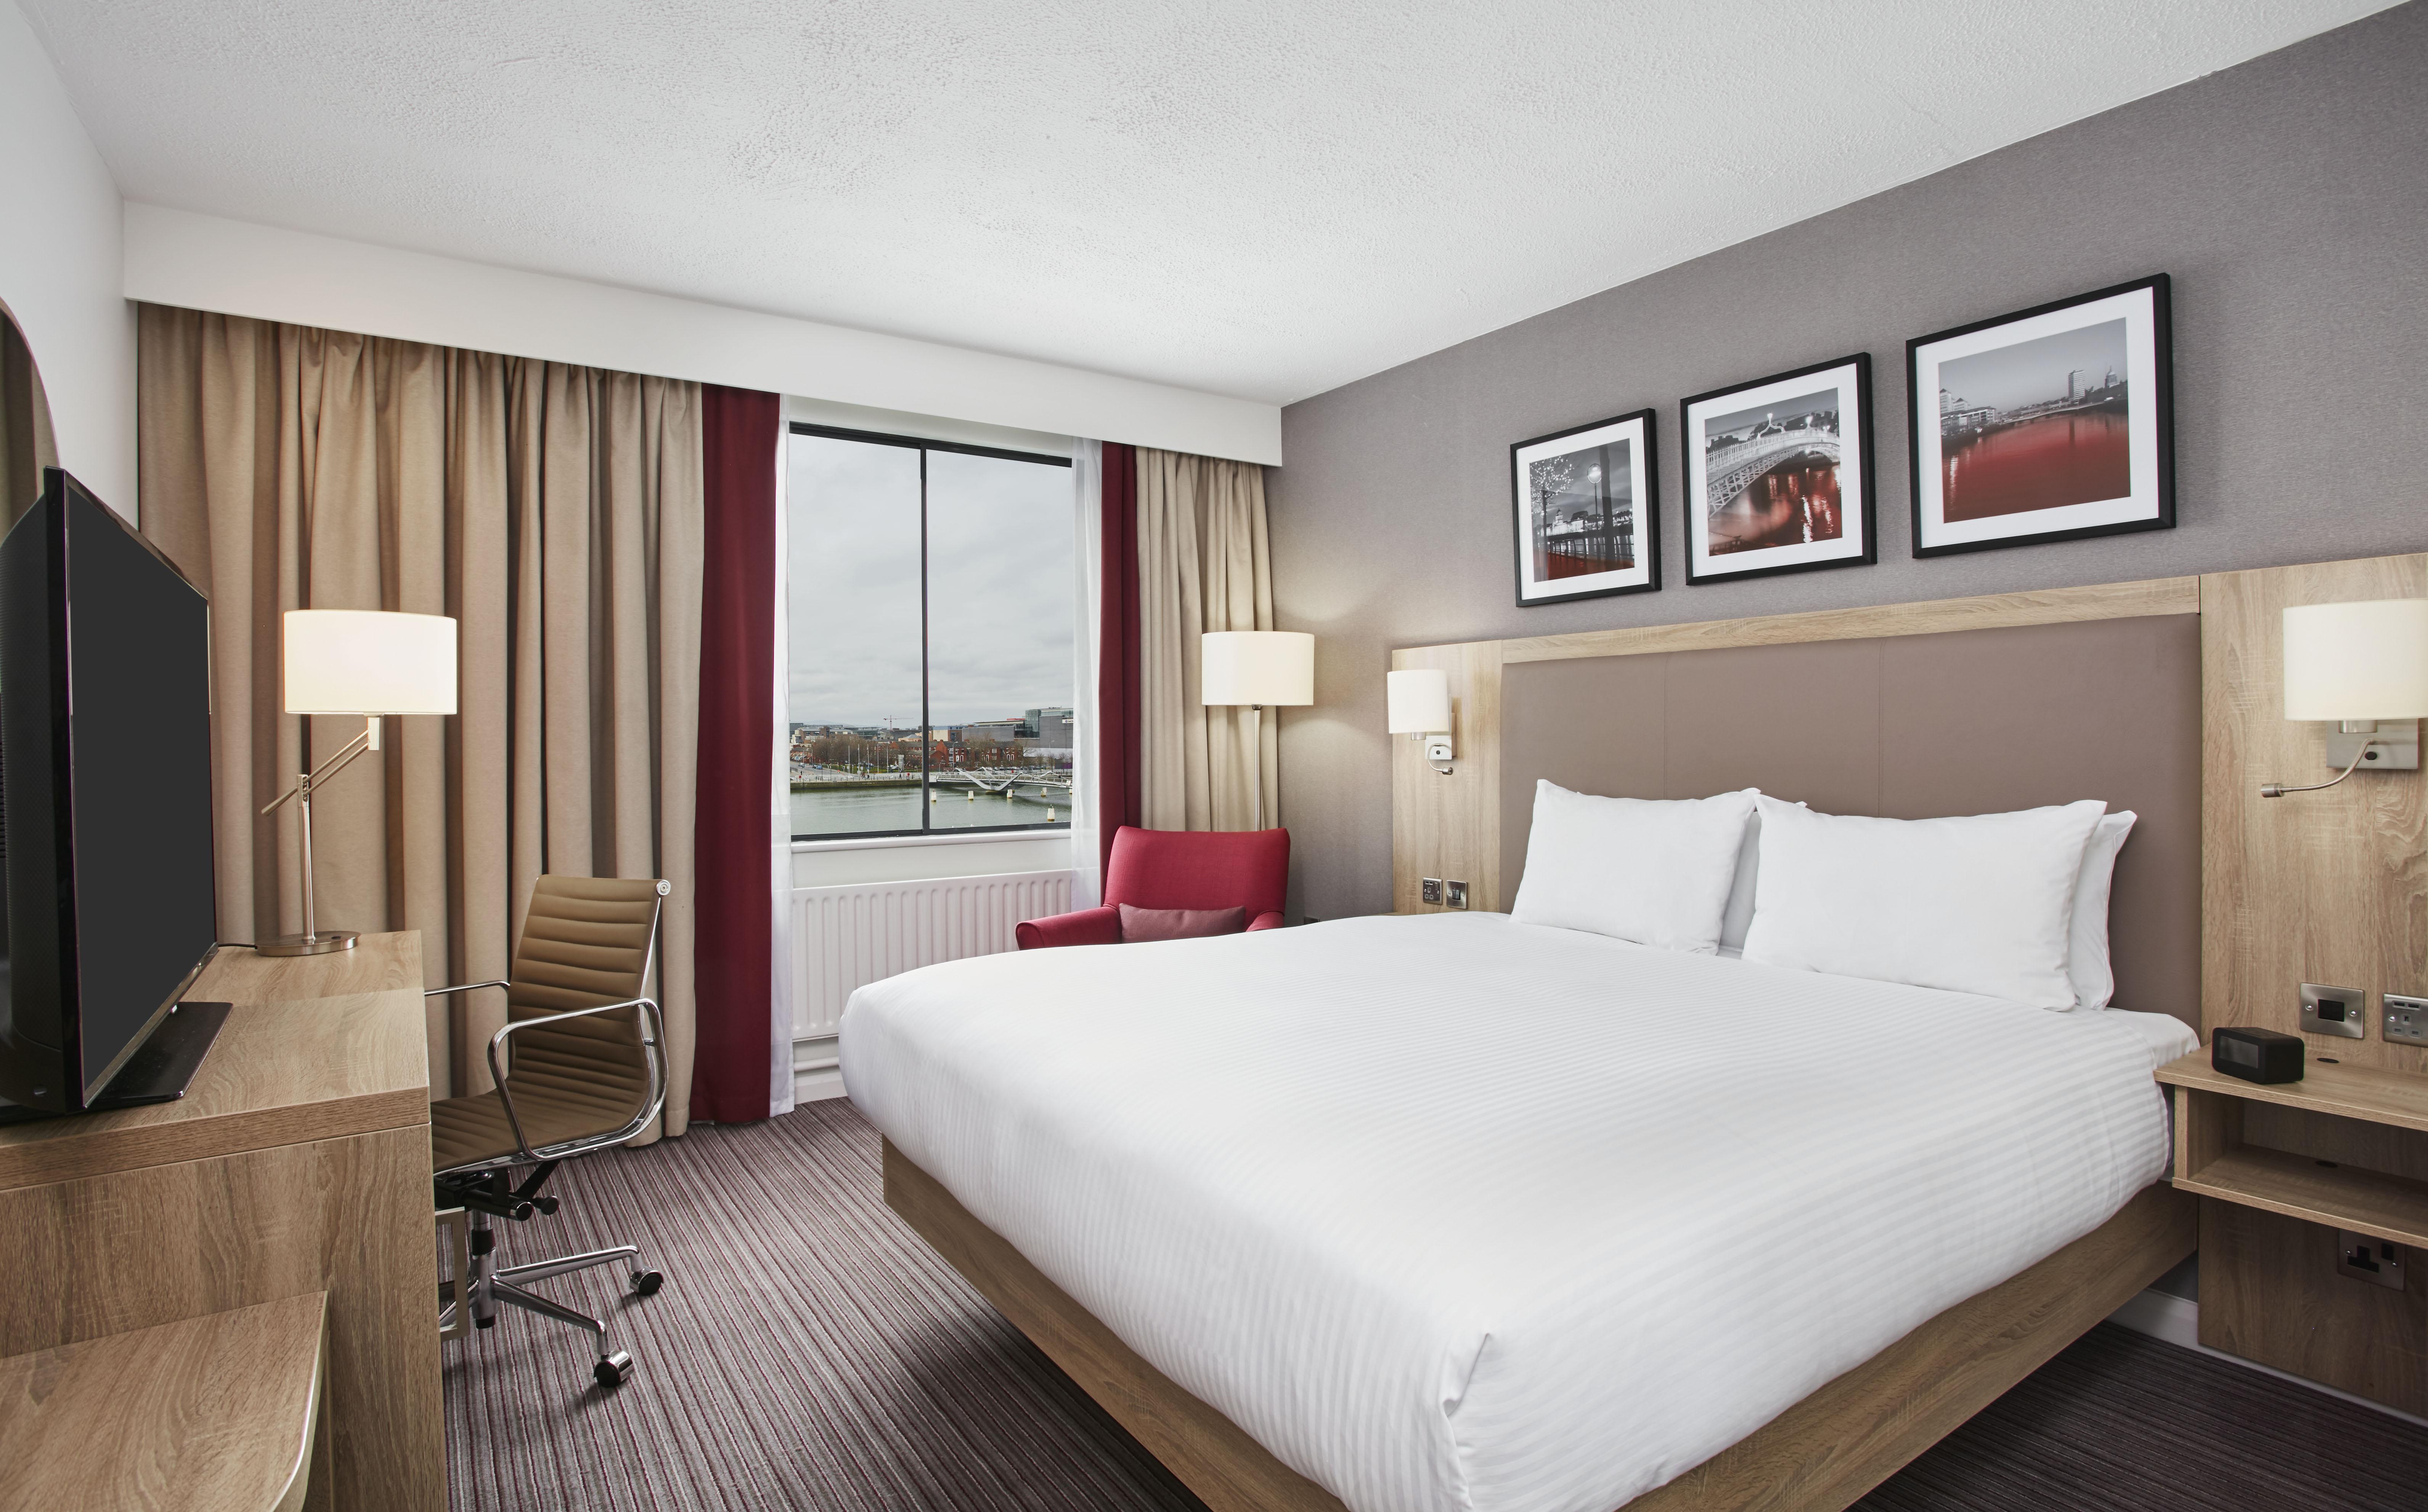 Hilton Garden Inn Makes Its Debut In Ireland